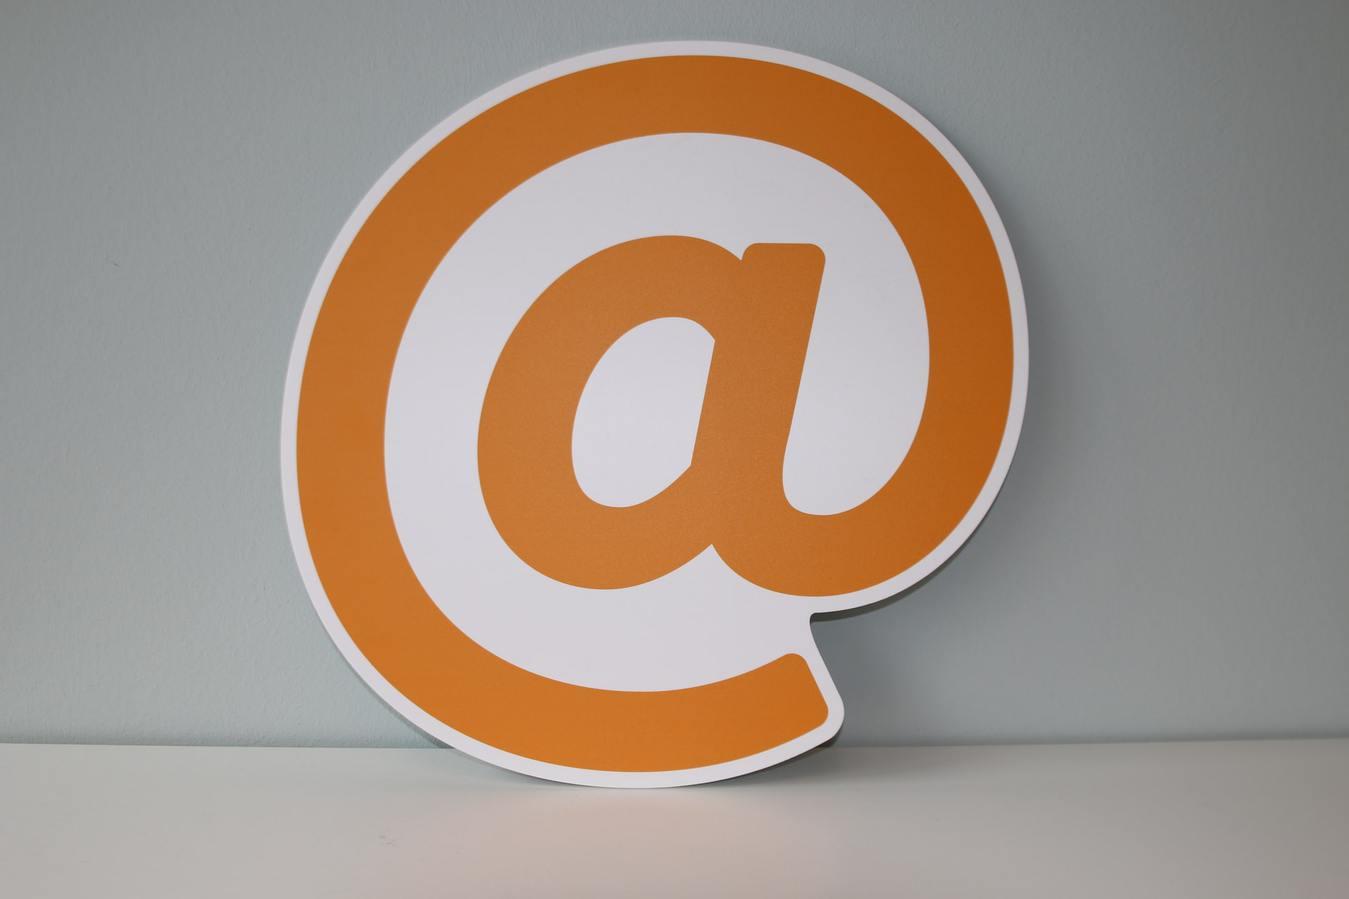 Simbolo arancione su uno sfondo grigio